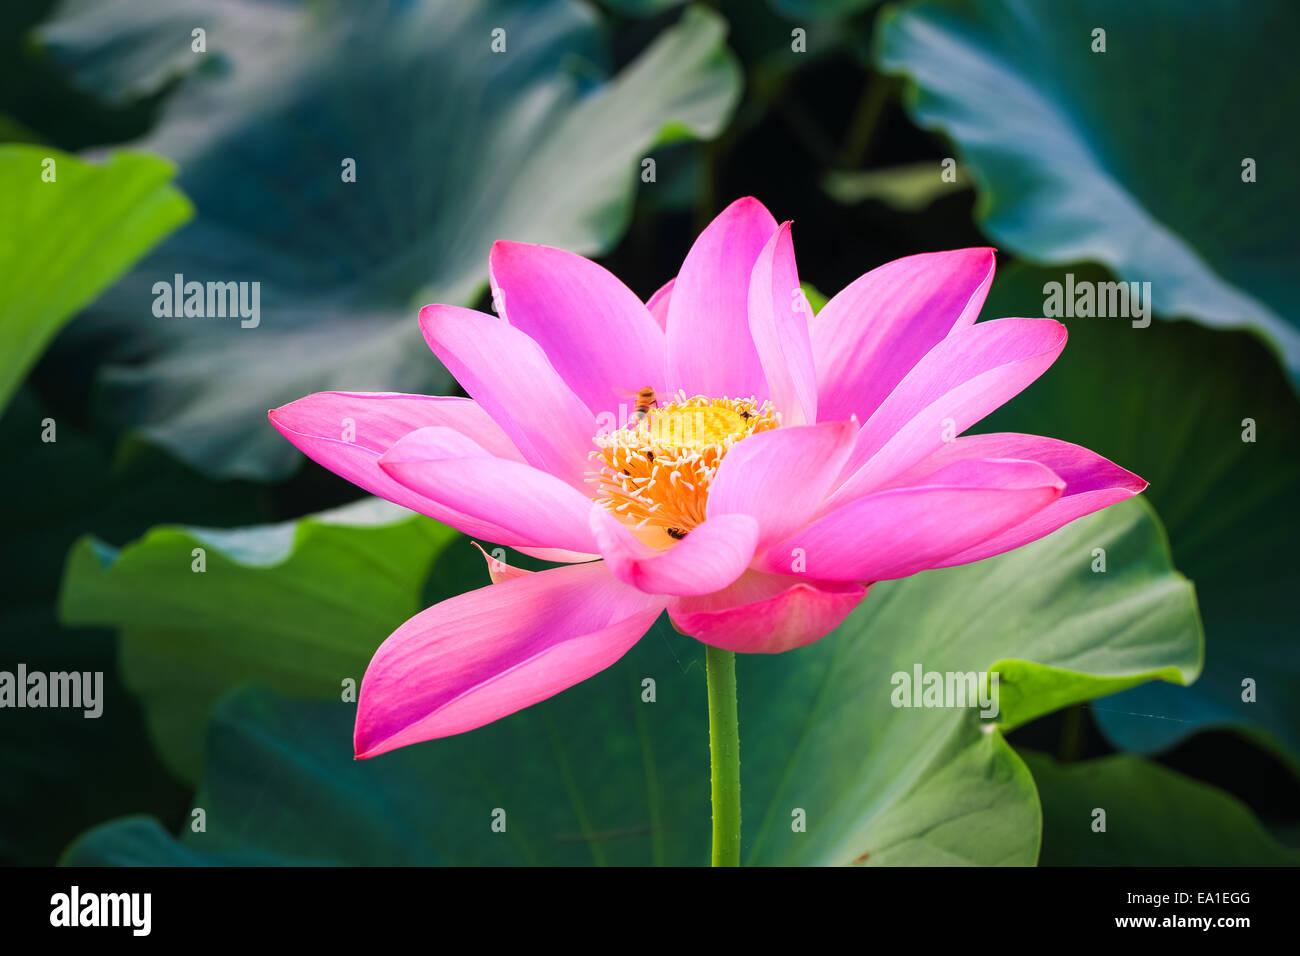 Beautiful Lotus Flower In Blooming Stock Photo 75021424 Alamy